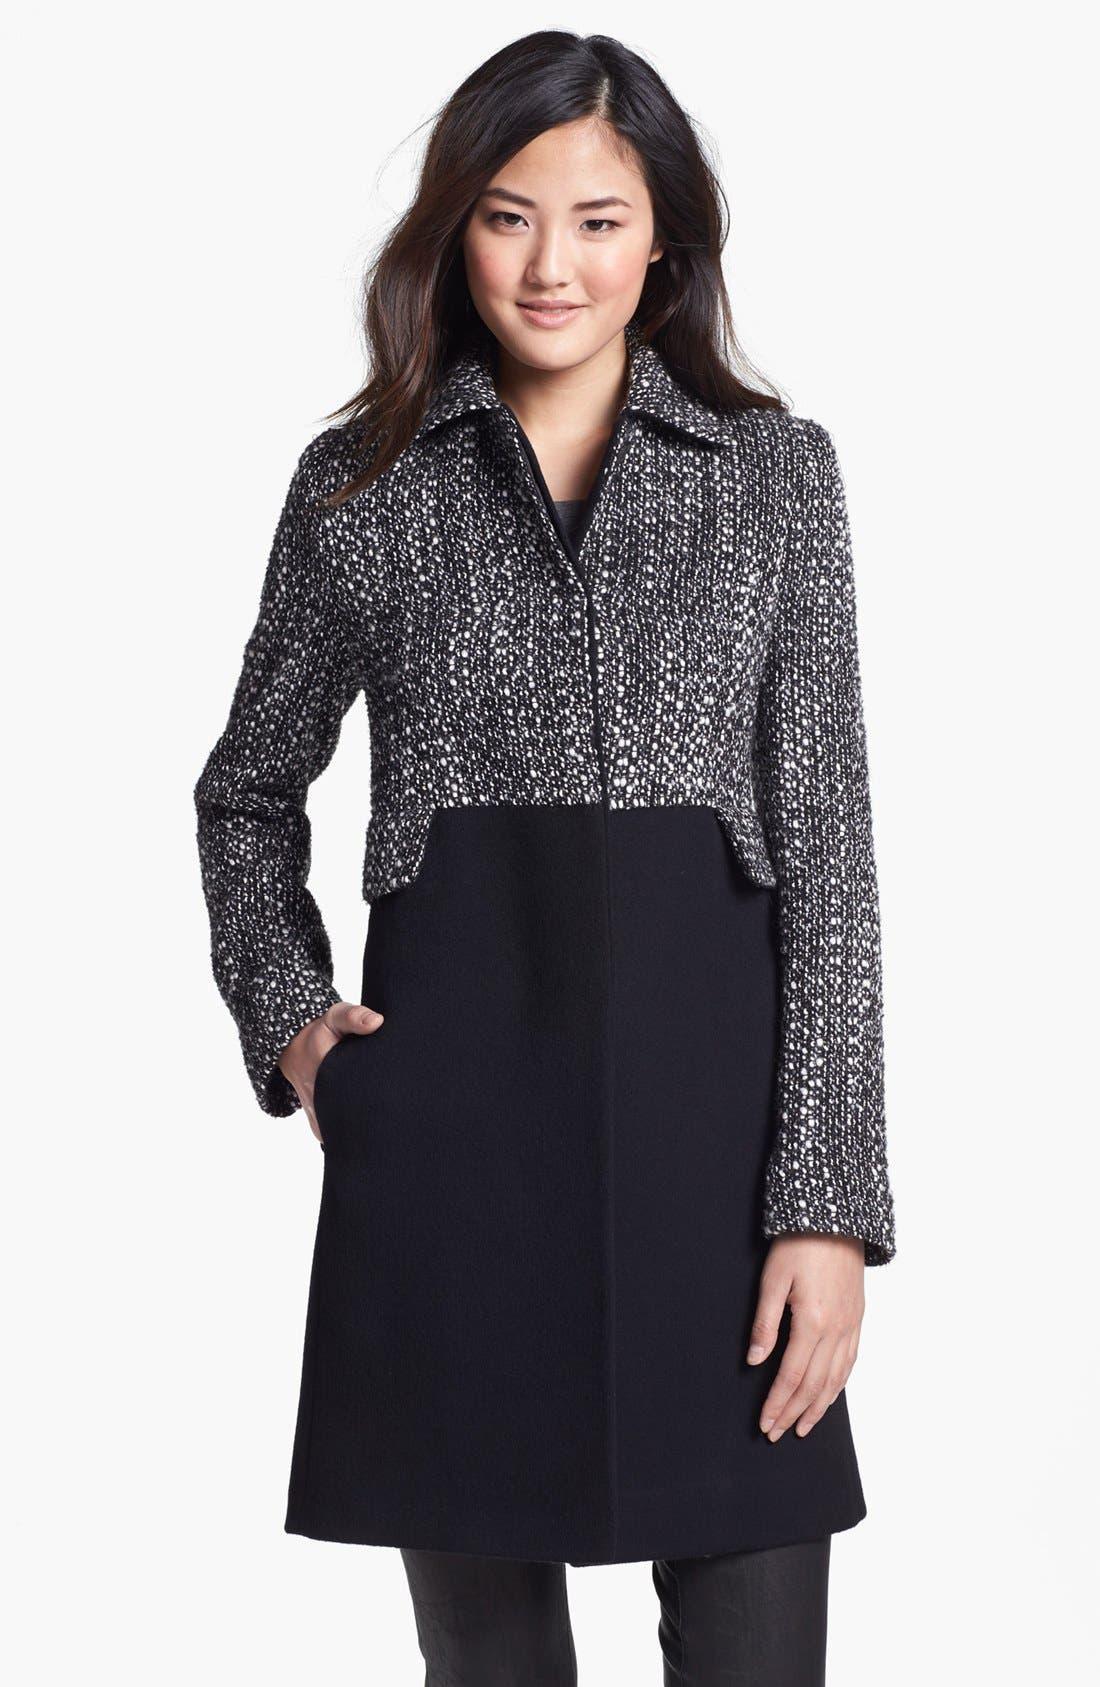 Main Image - Fleurette Thistle Tweed & Loro Piana Wool City Coat (Petite)